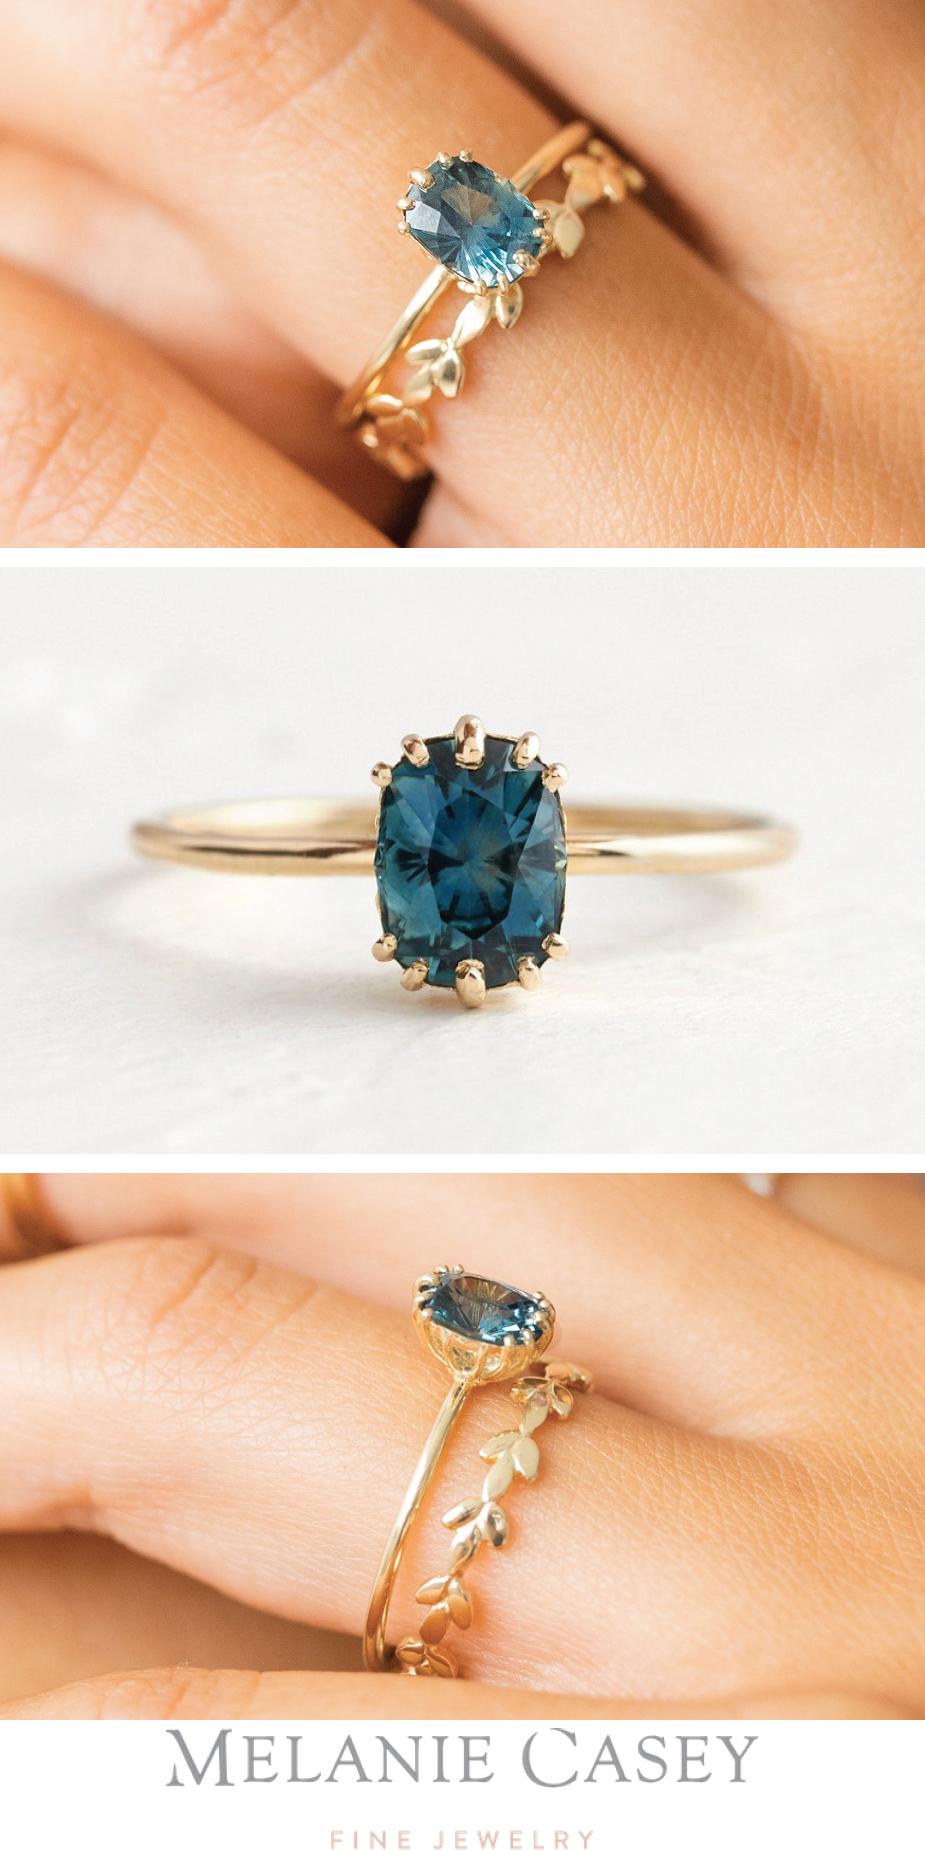 3.5ct natural aquamarine engagement ring 14k rose gold diamond wedding band anniversary ring HALO diamond bridal ring 9mm cushion Aquamarine - Fine Jewelry Ideas #aquamarineengagementring